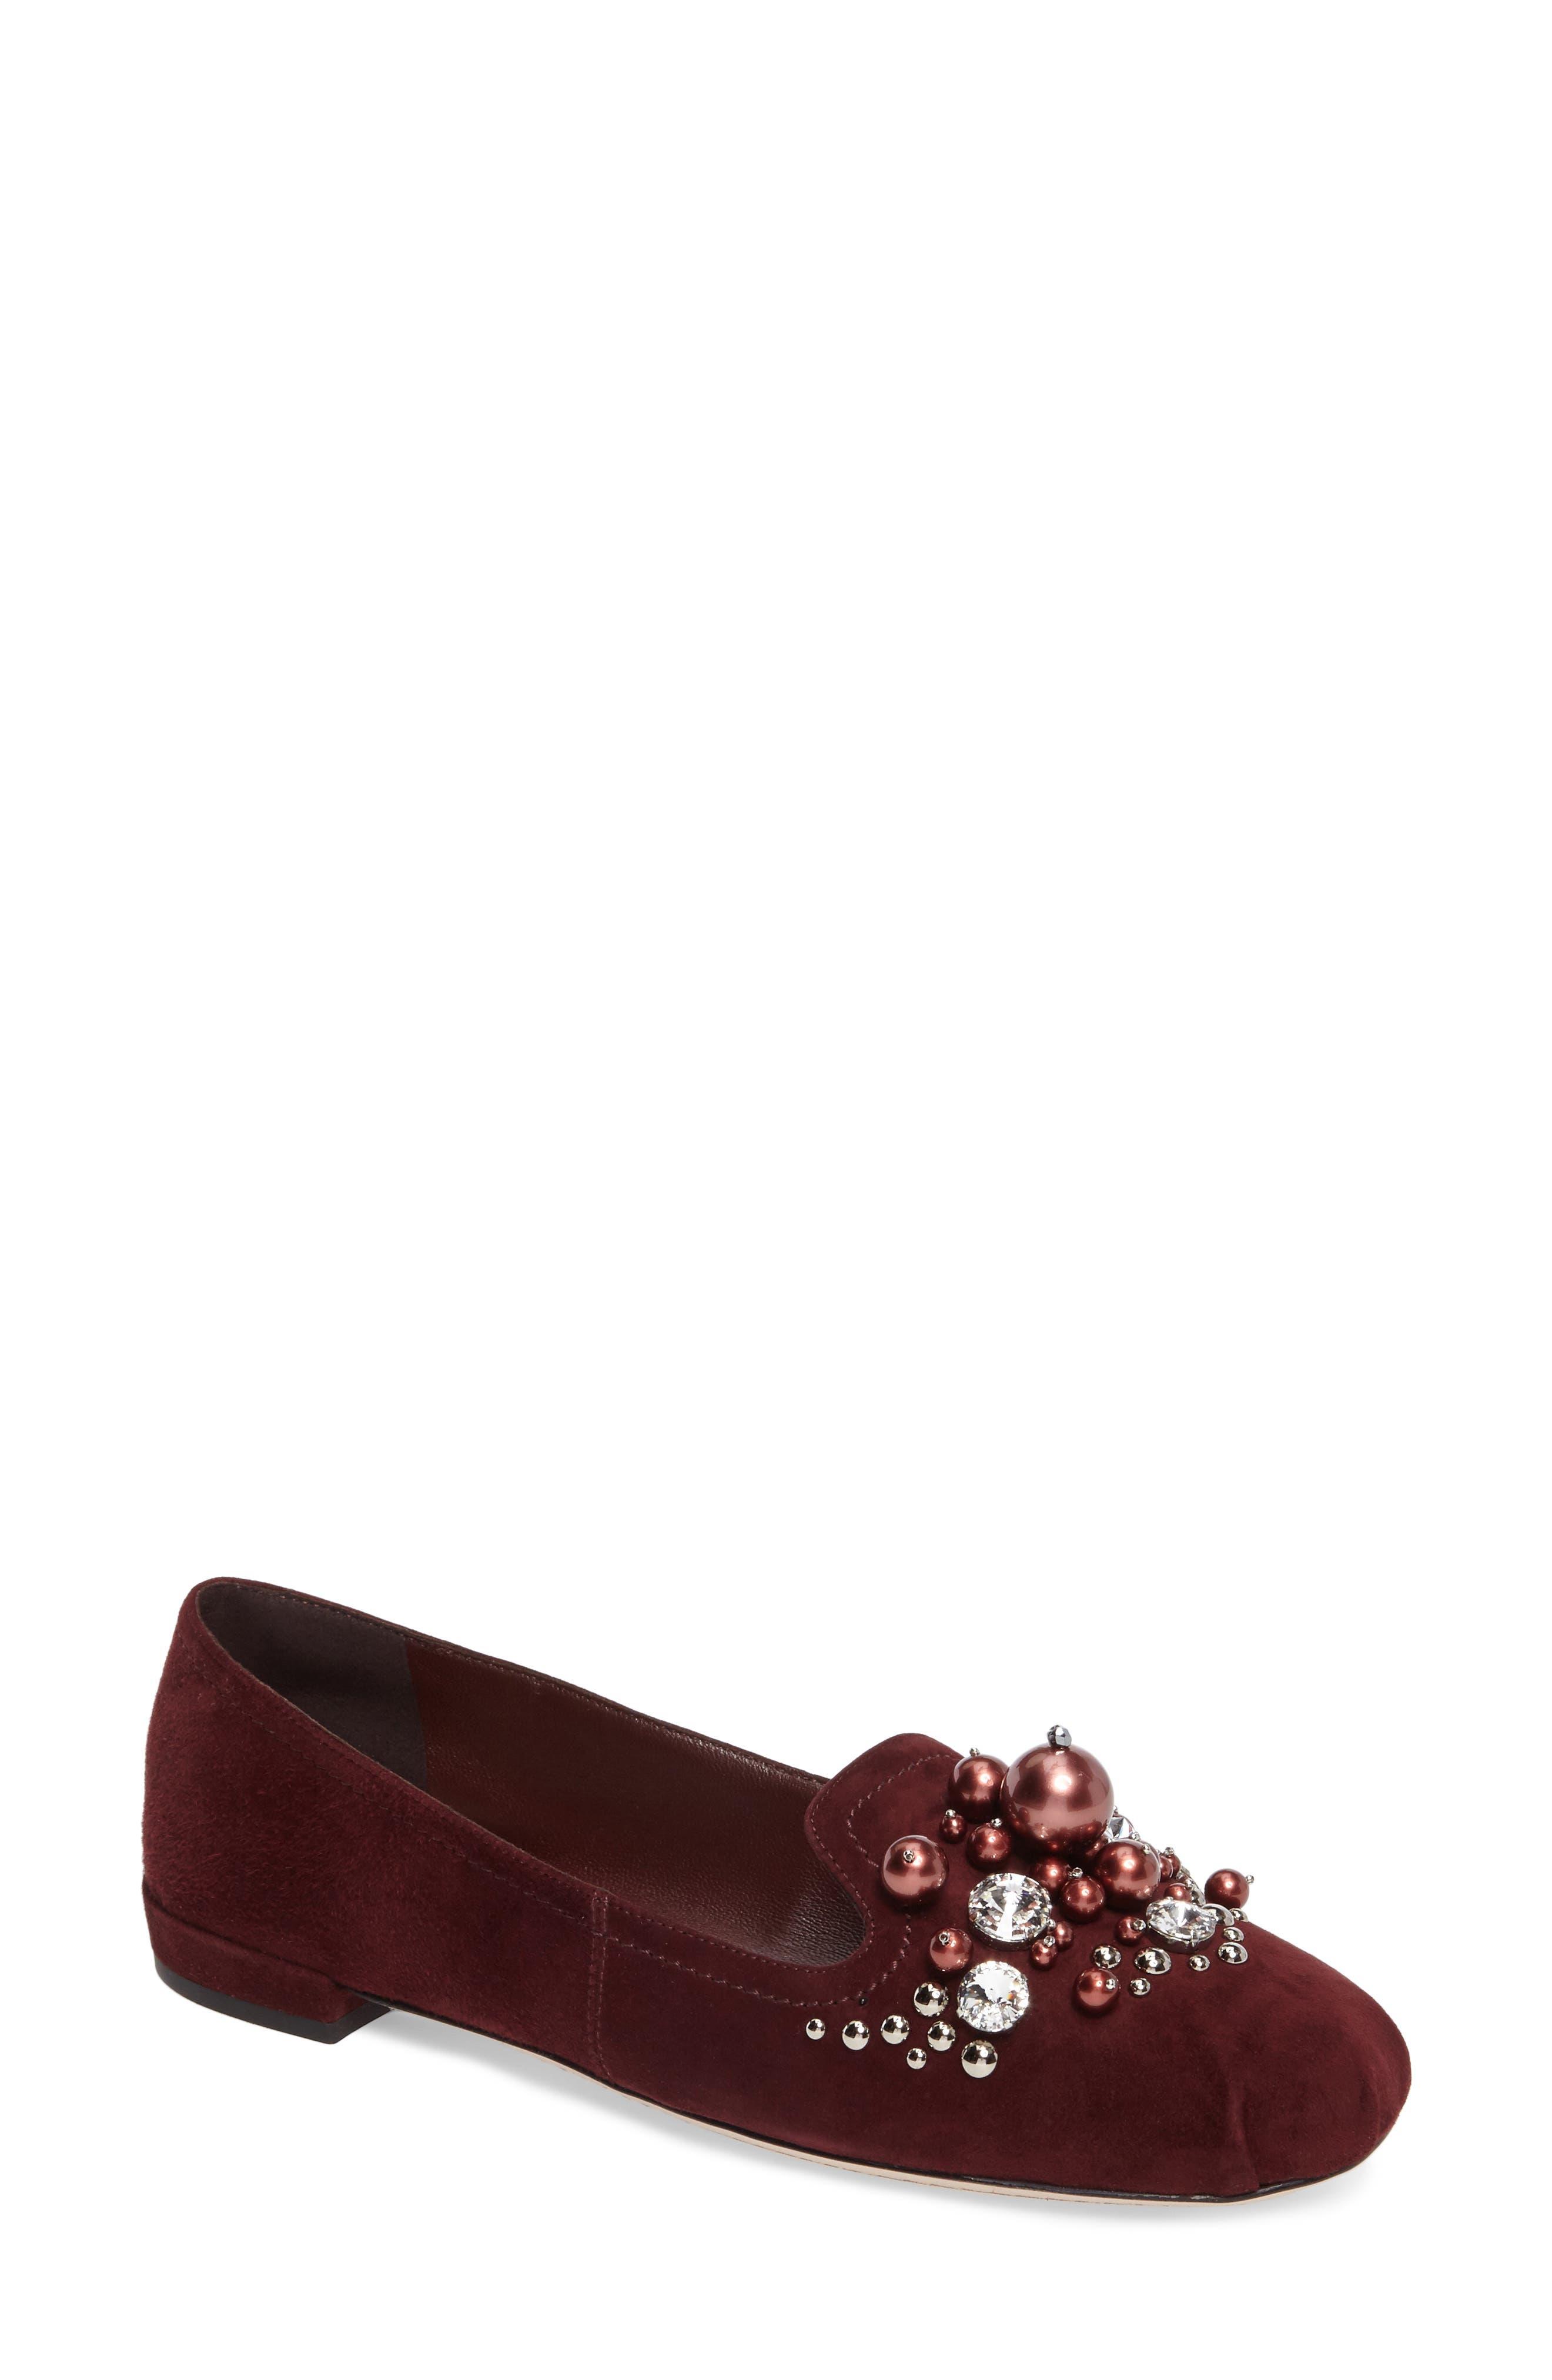 Alternate Image 1 Selected - Miu Miu Embellished Loafer (Women)